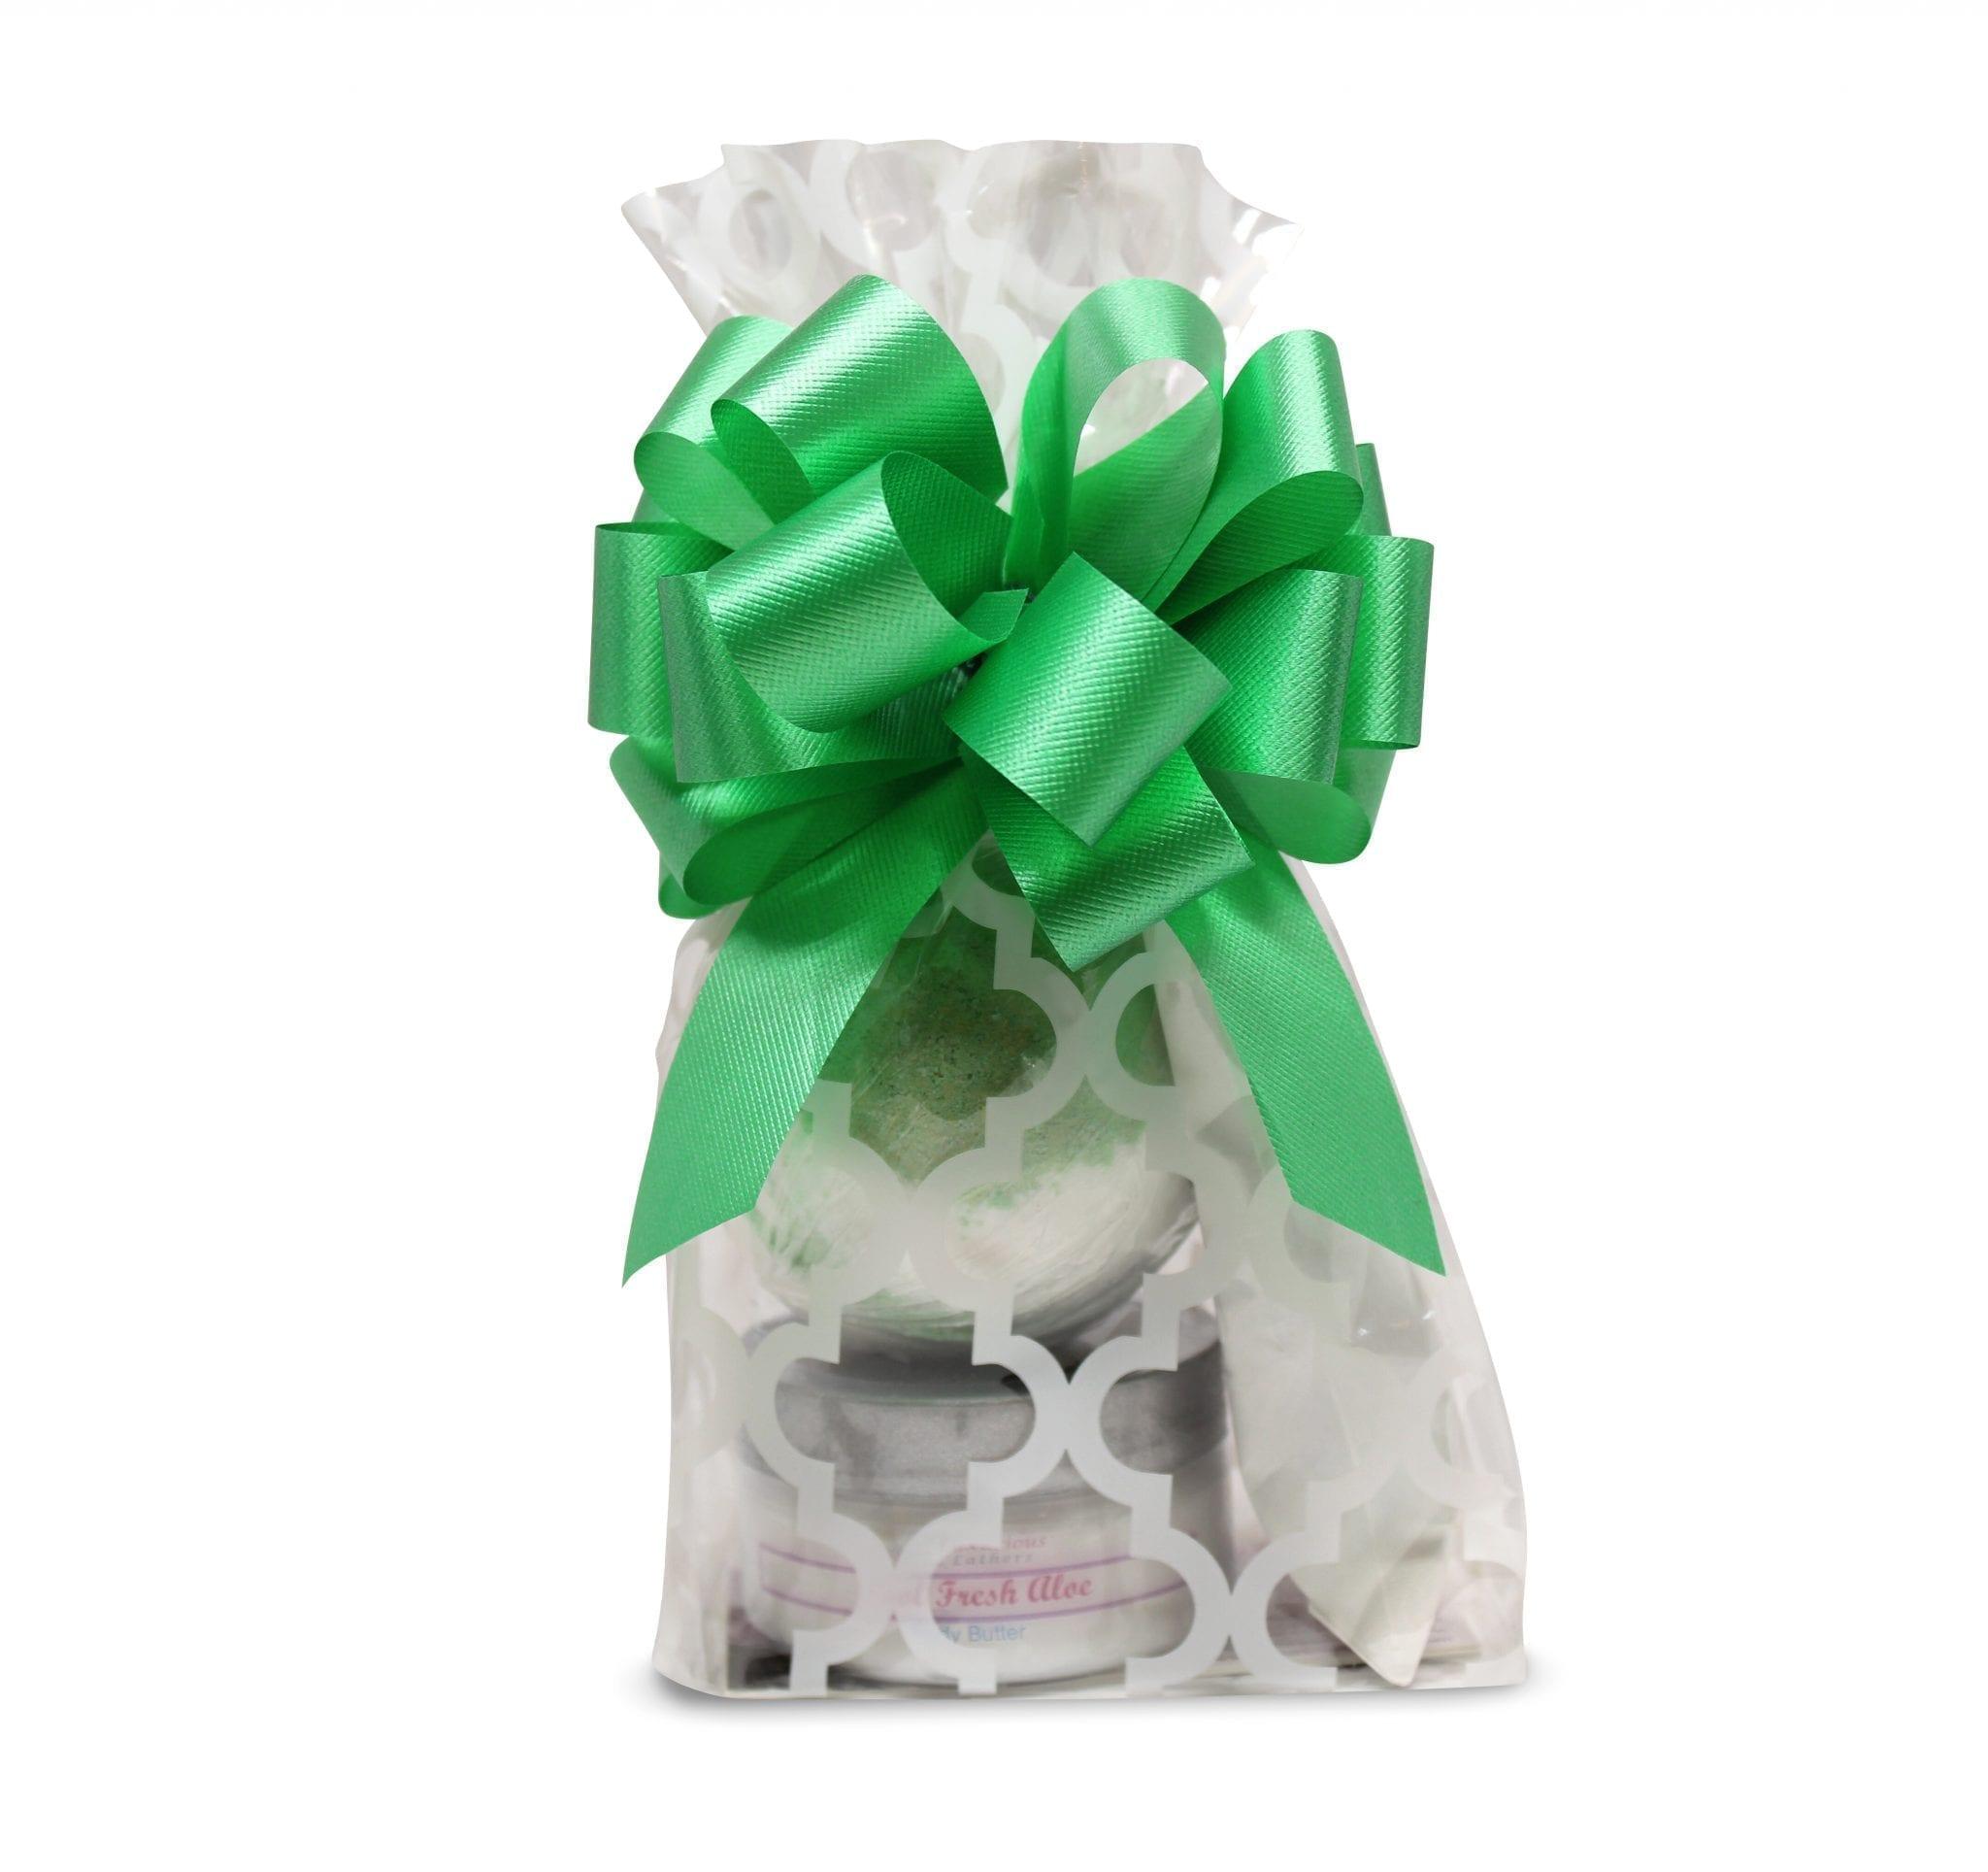 Cool Fresh Aloe Gift Bag